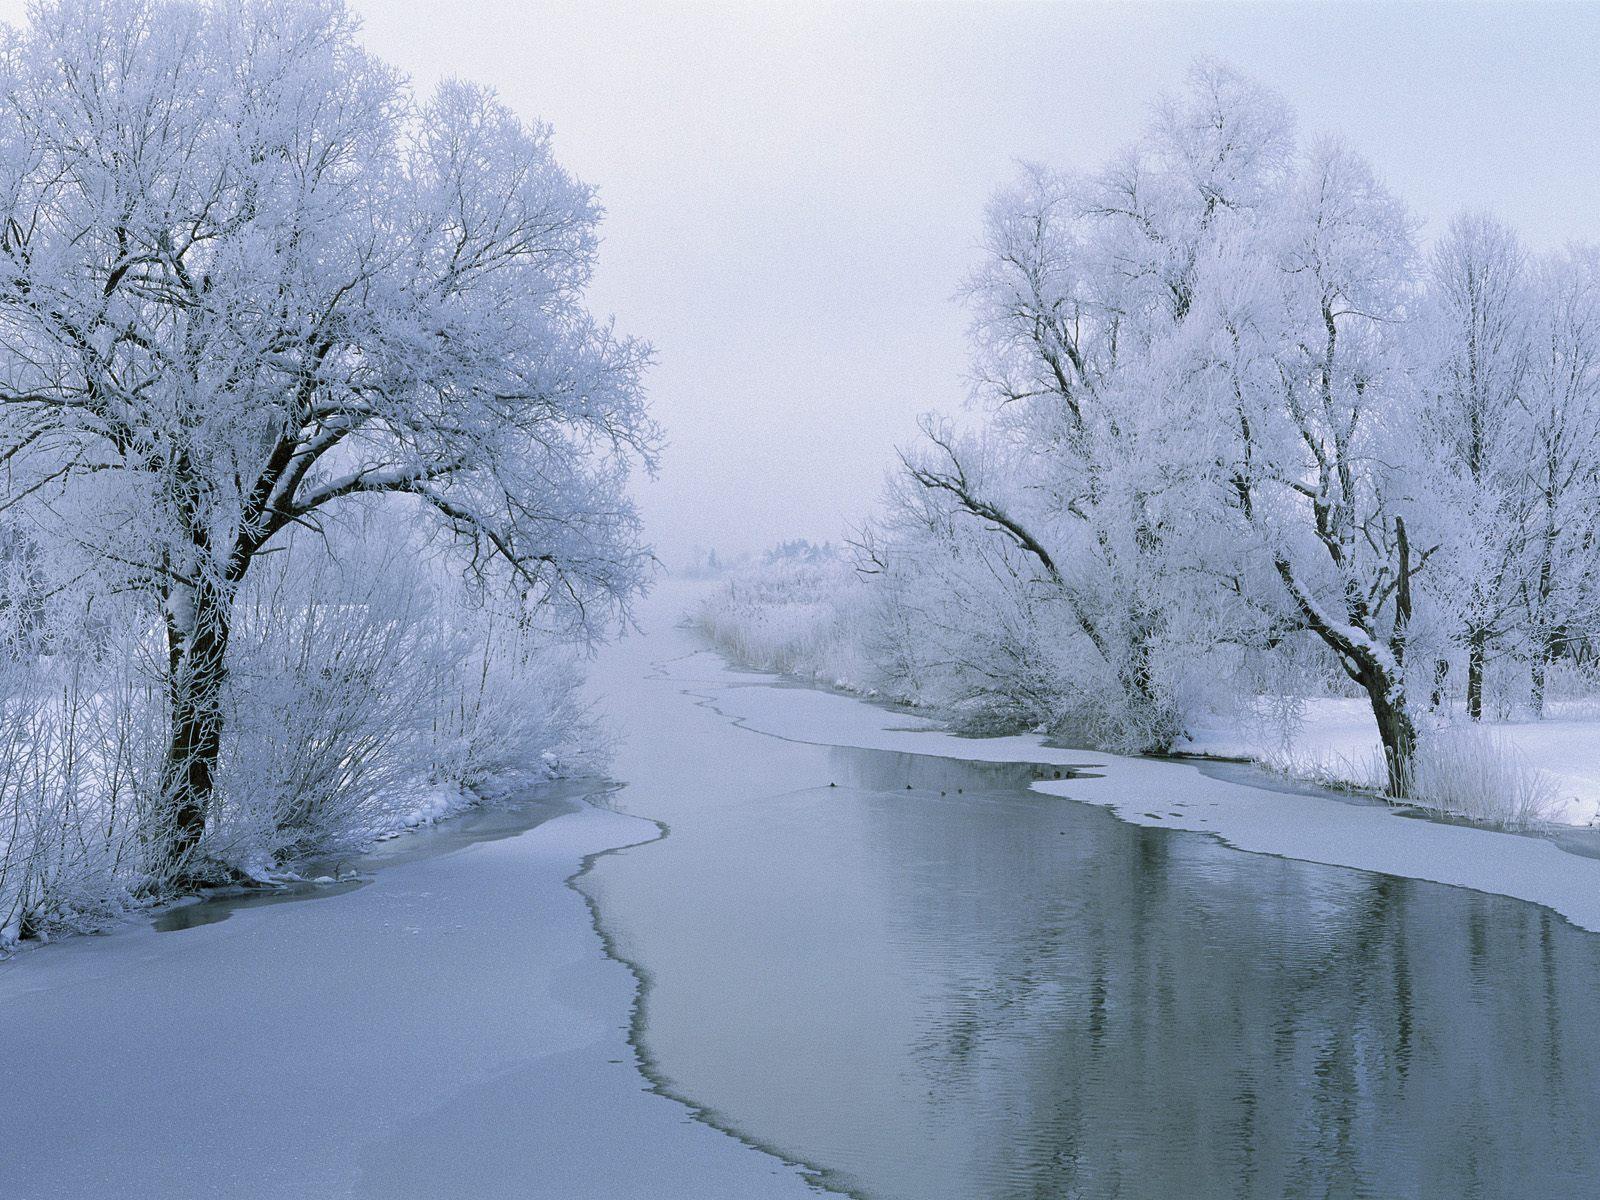 Winter HD Wallpapers Winter Desktop Wallpapers Nature Winter 1600x1200